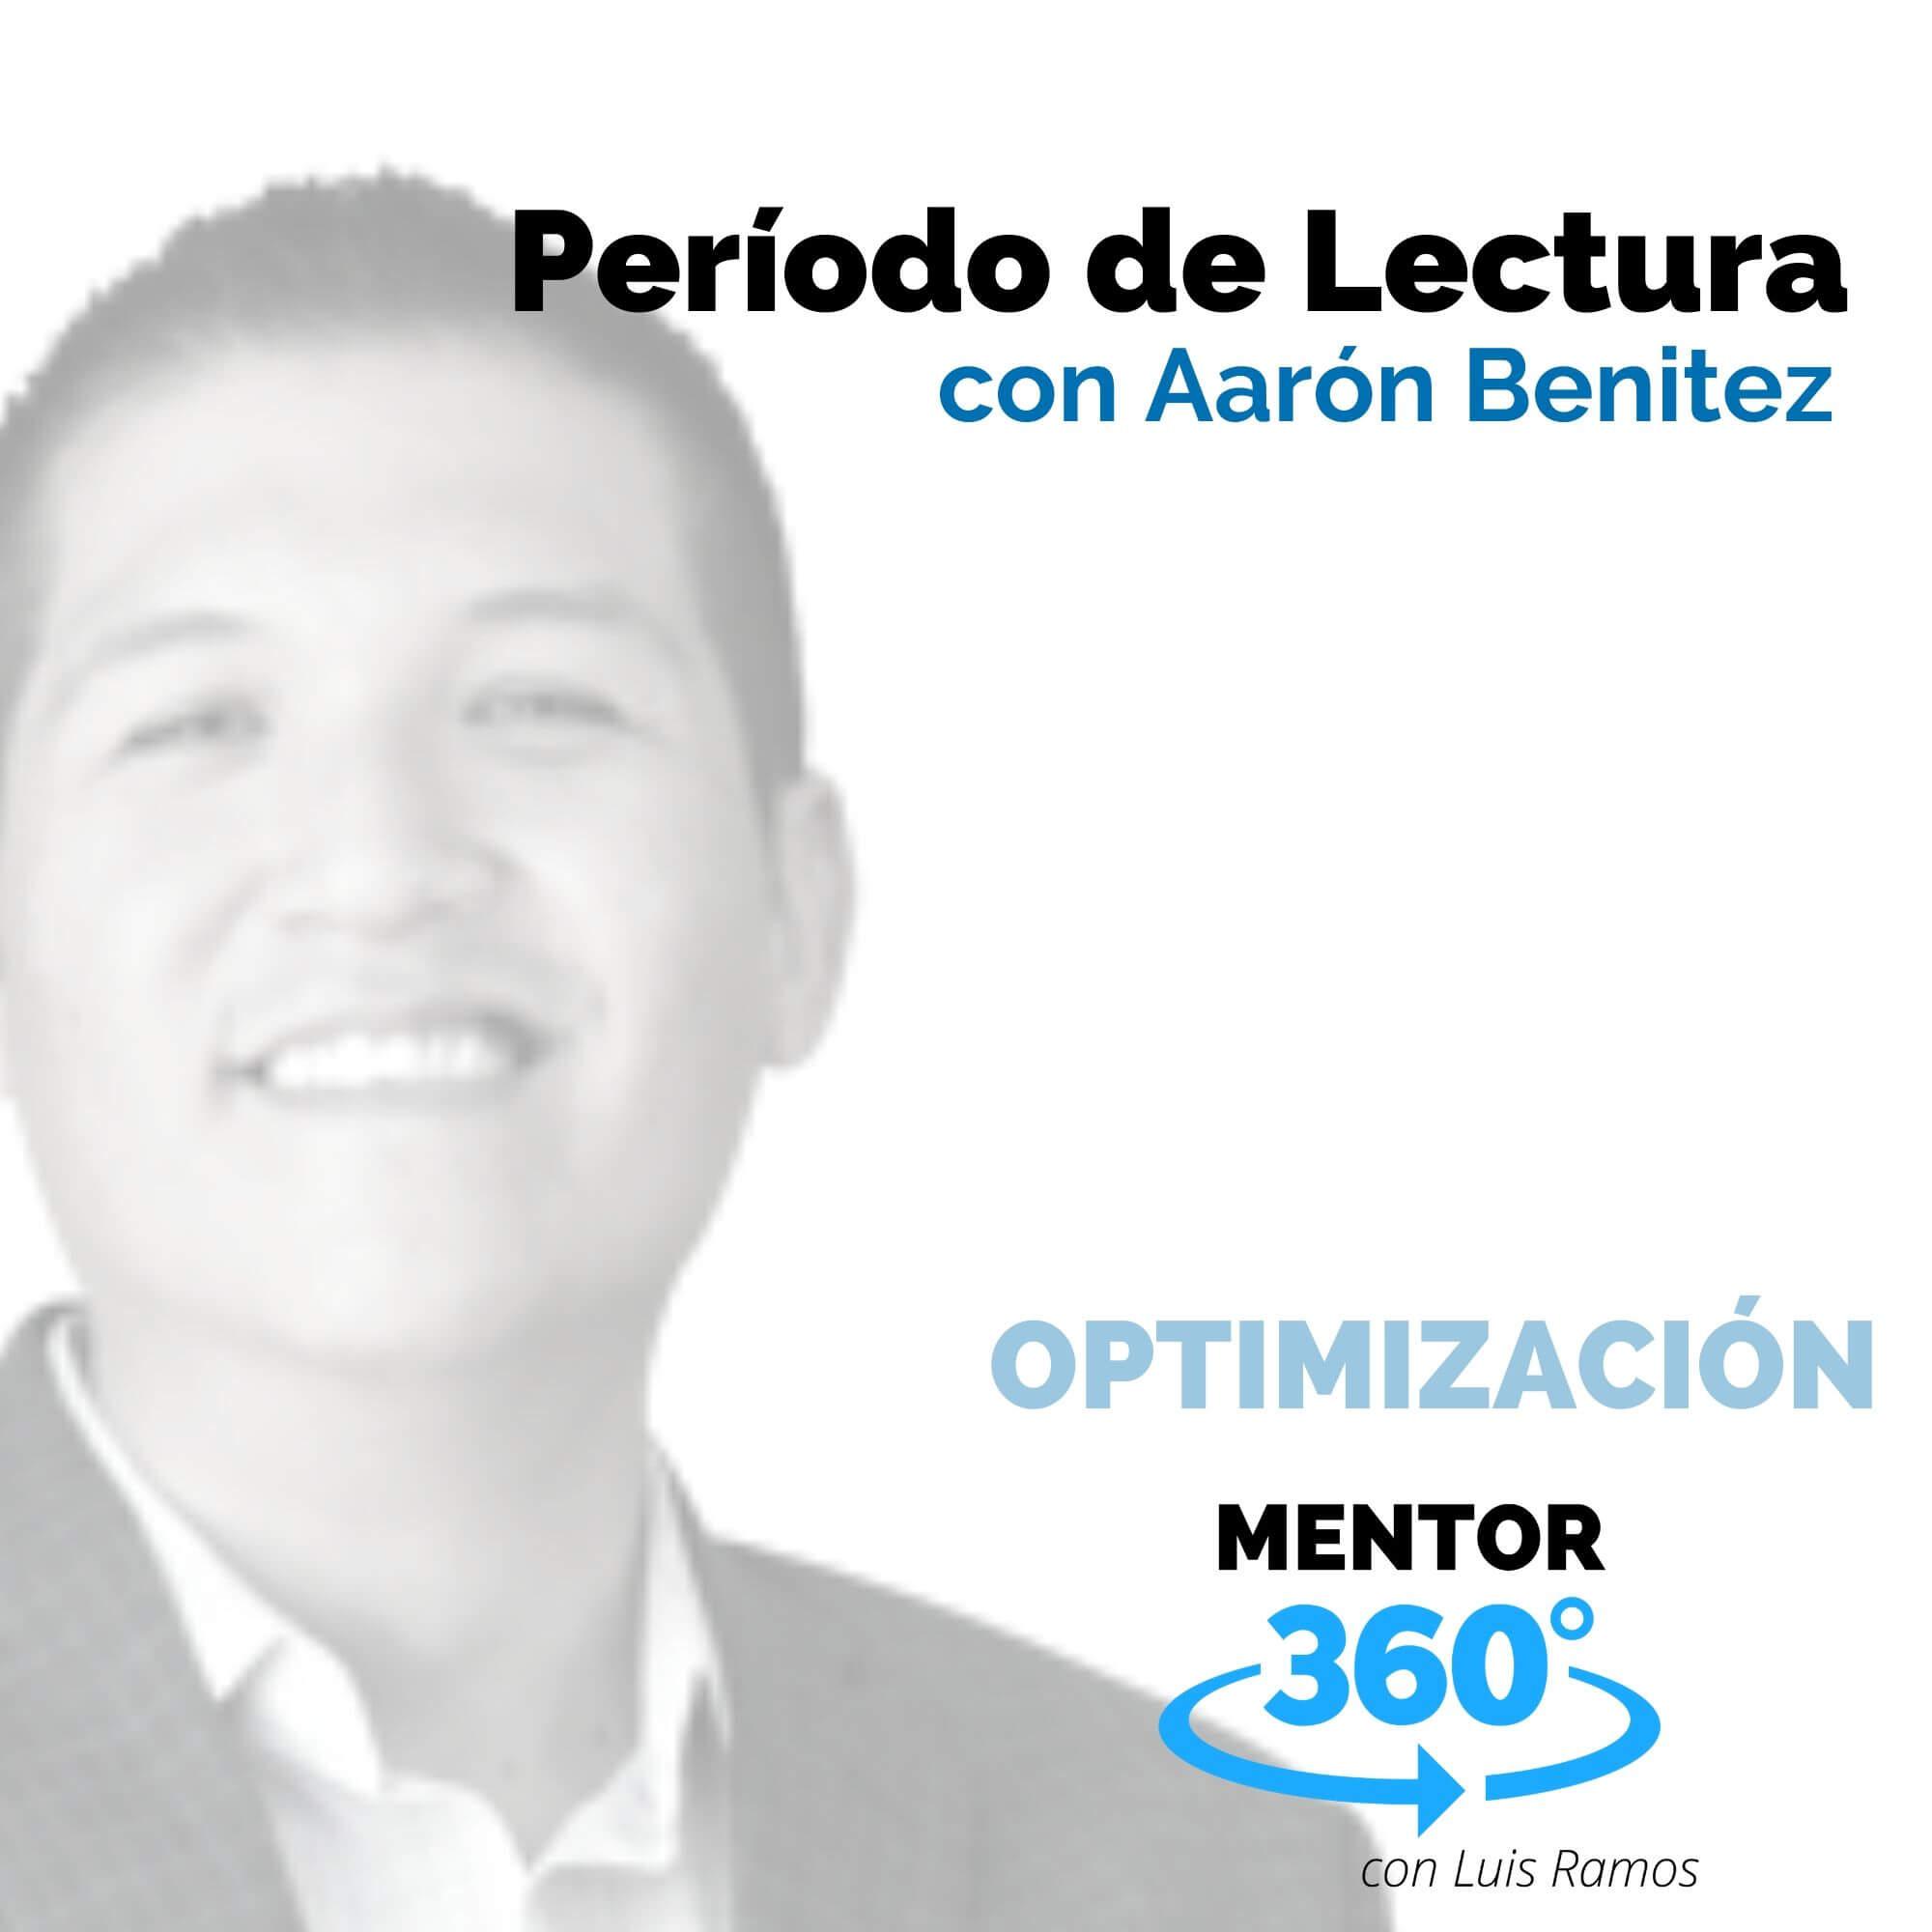 Período de Lectura, con Aarón Benítez - OPTIMIZACIÓN - MENTOR360